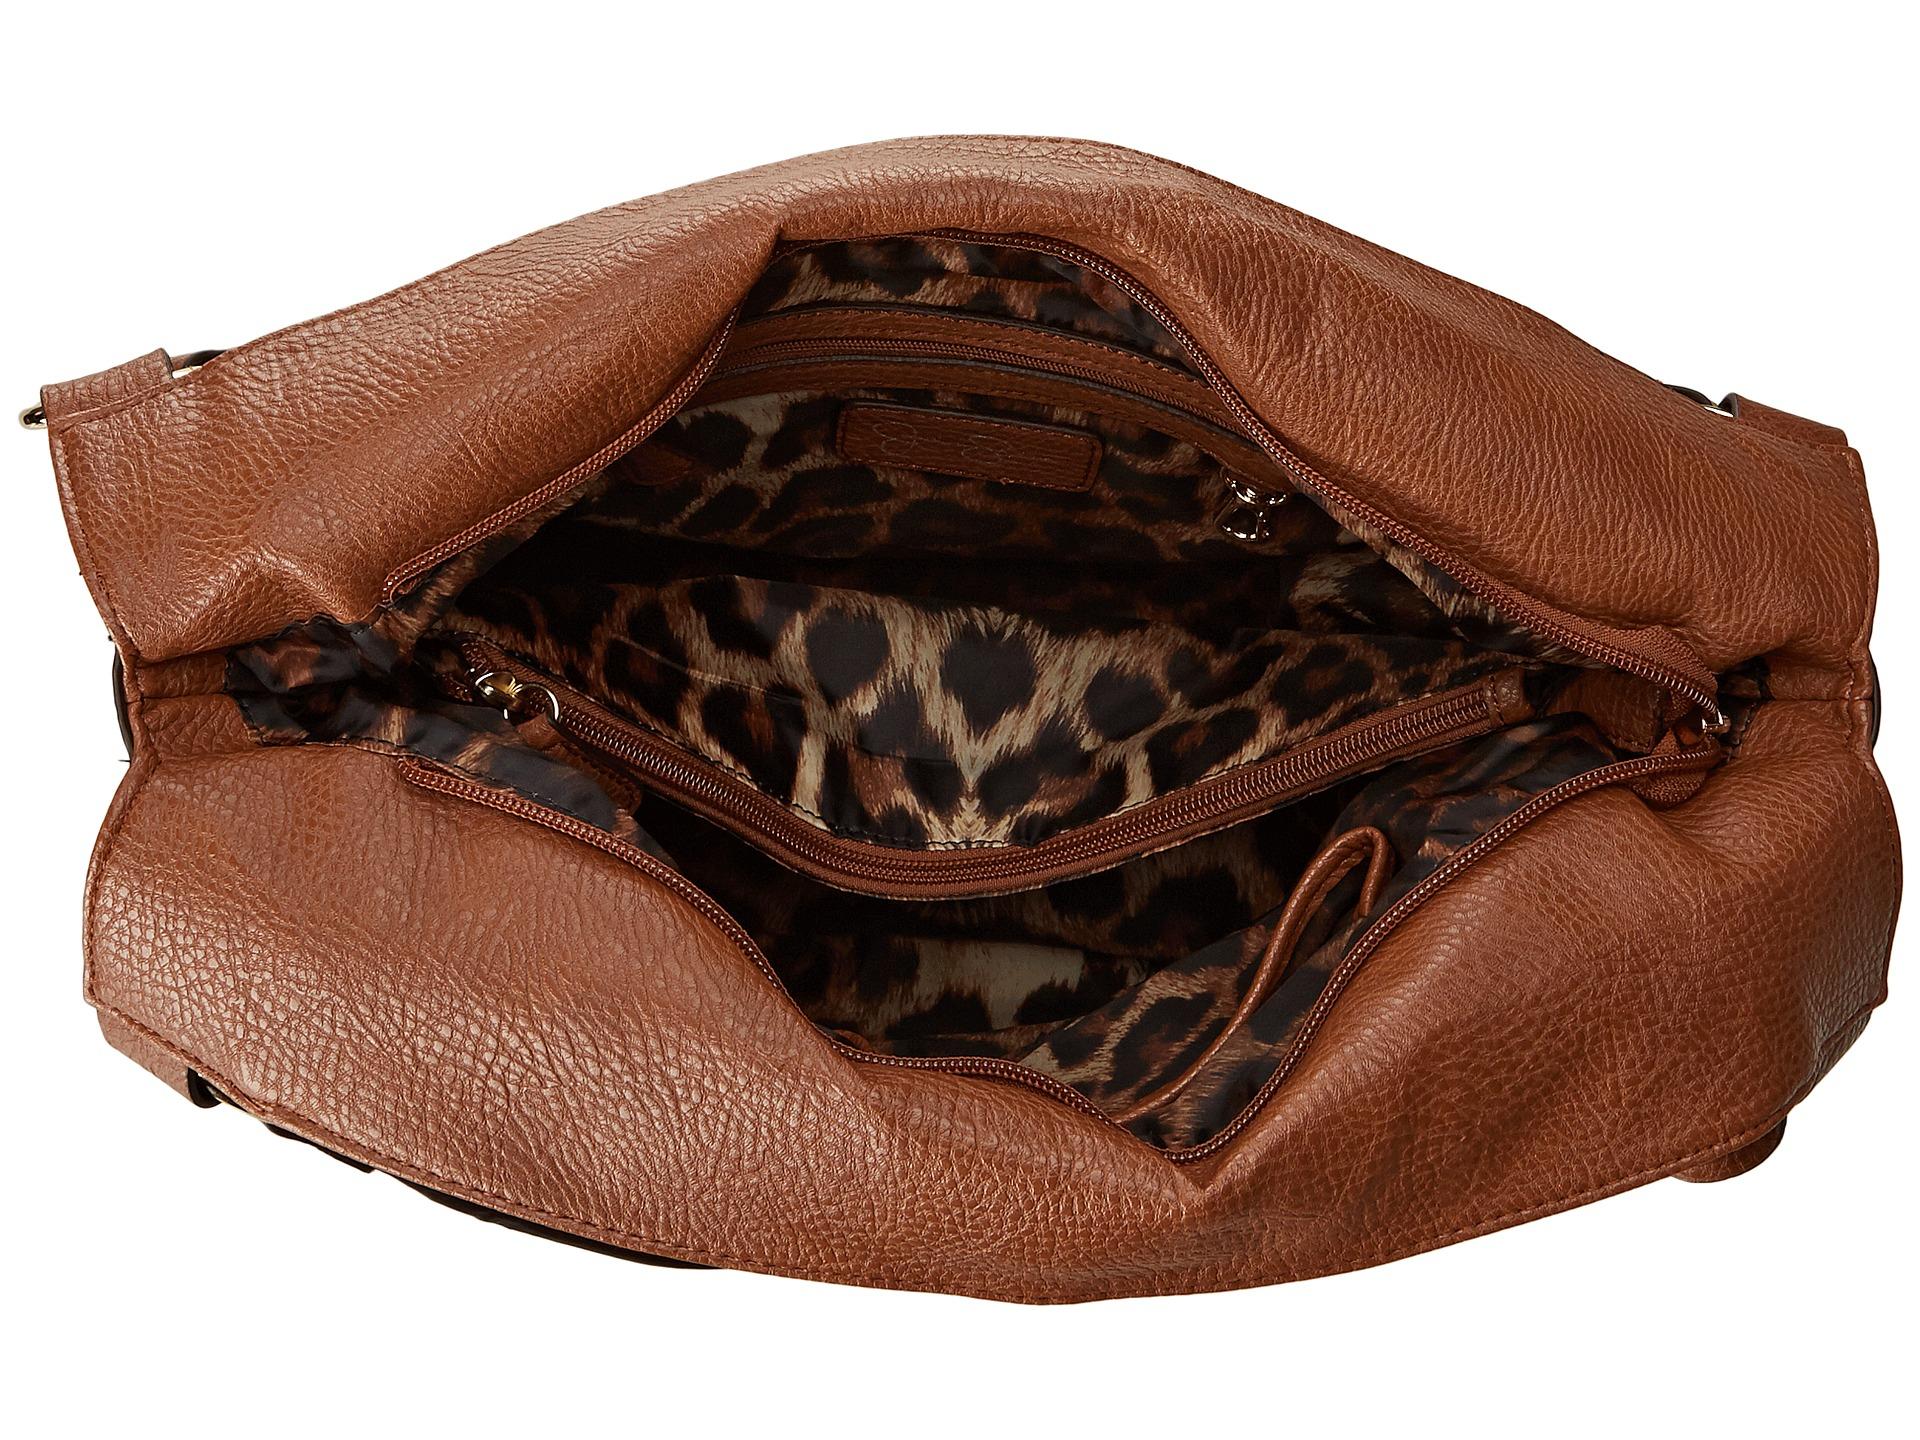 Lyst - Jessica simpson Dream Weaver Bucket in Brown 39718480315f5